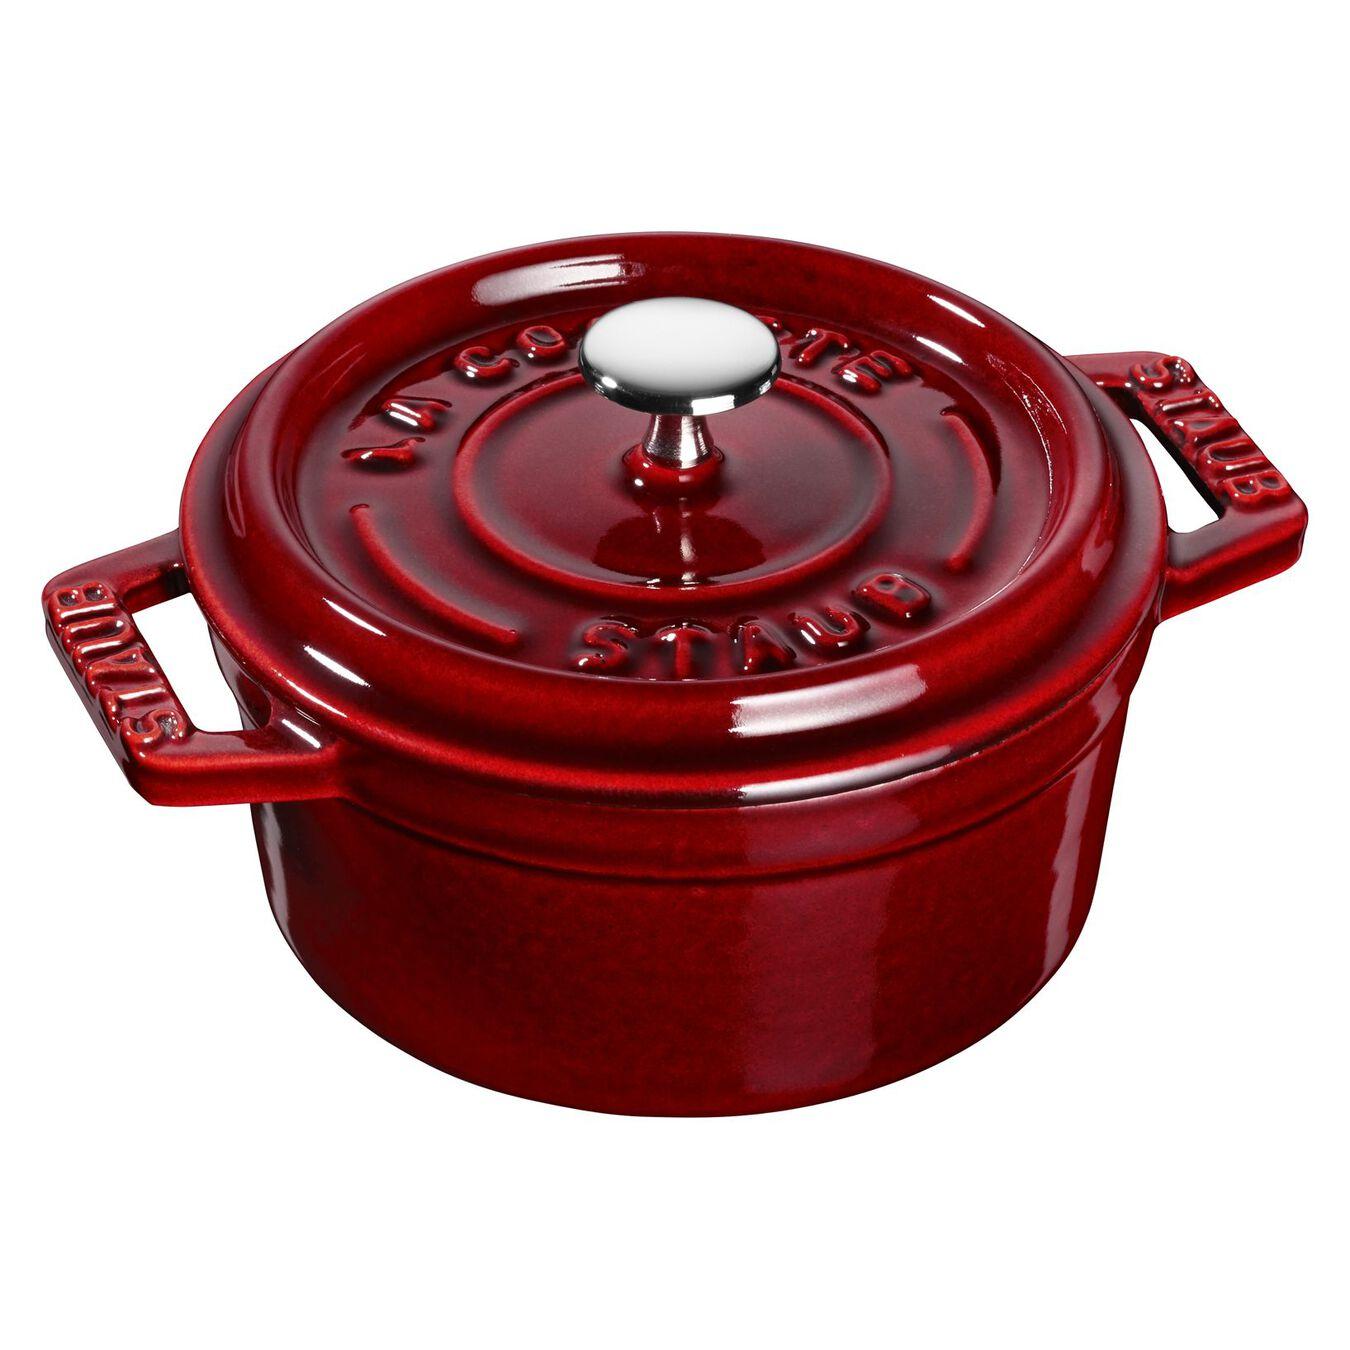 250 ml Cast iron round Mini Cocotte, grenadine-red,,large 2